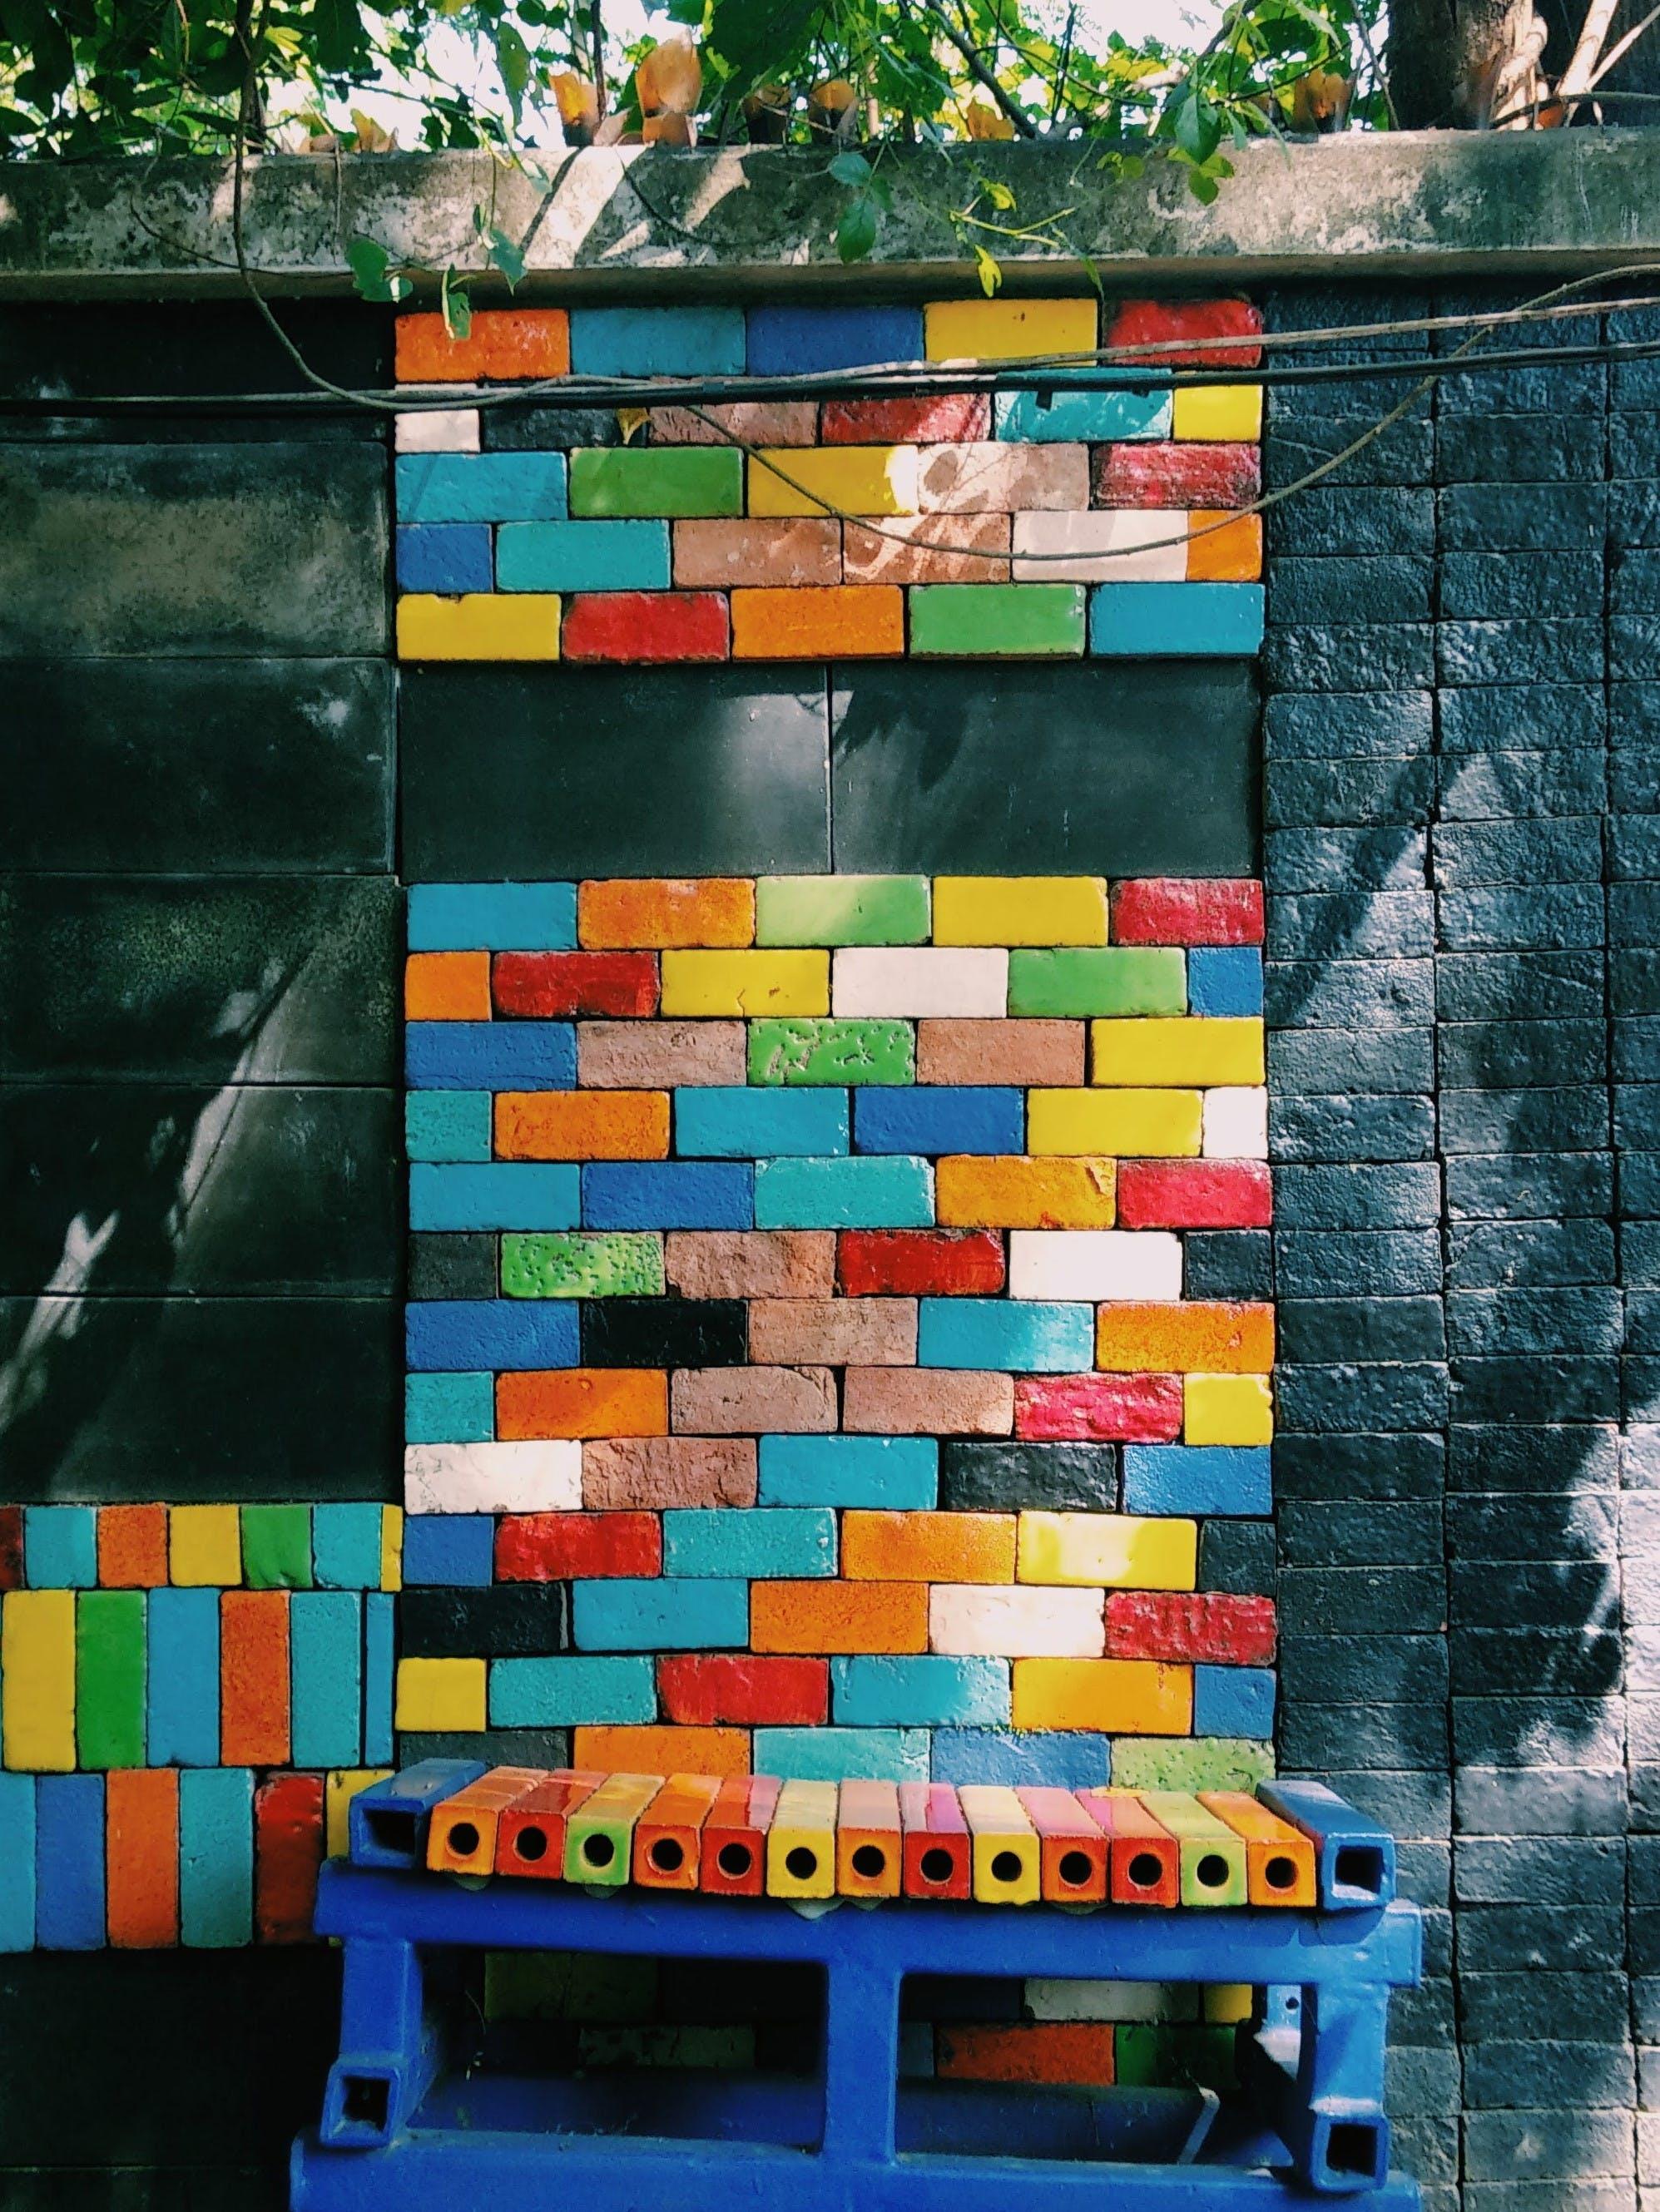 Free stock photo of brick, brick texture, brick wall, bricks